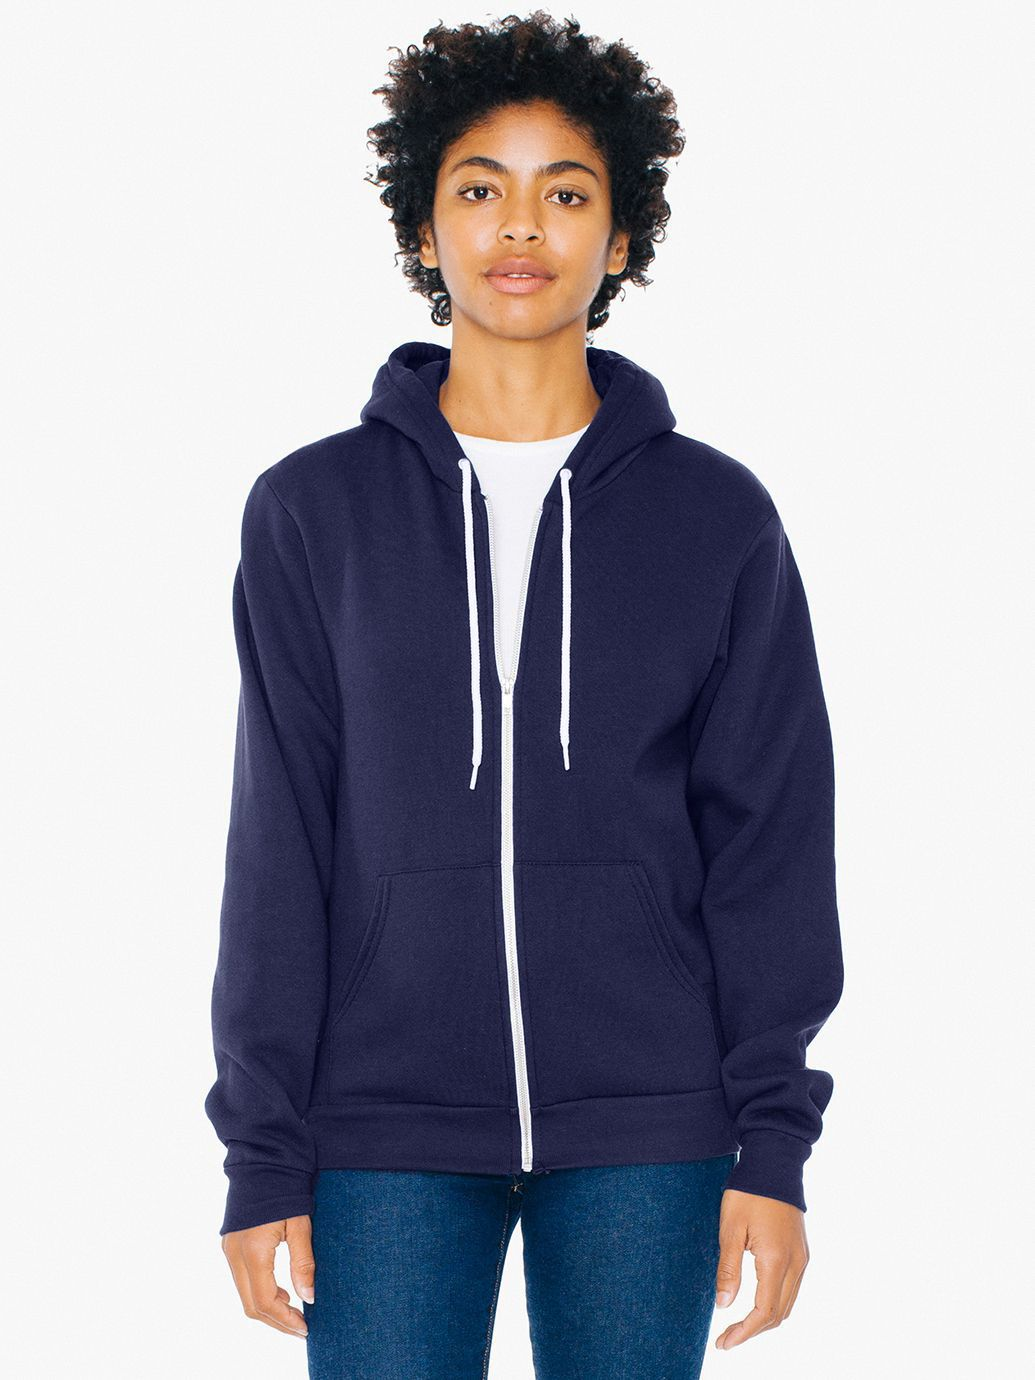 American Apparel - Youth Flex Fleece Hoodie